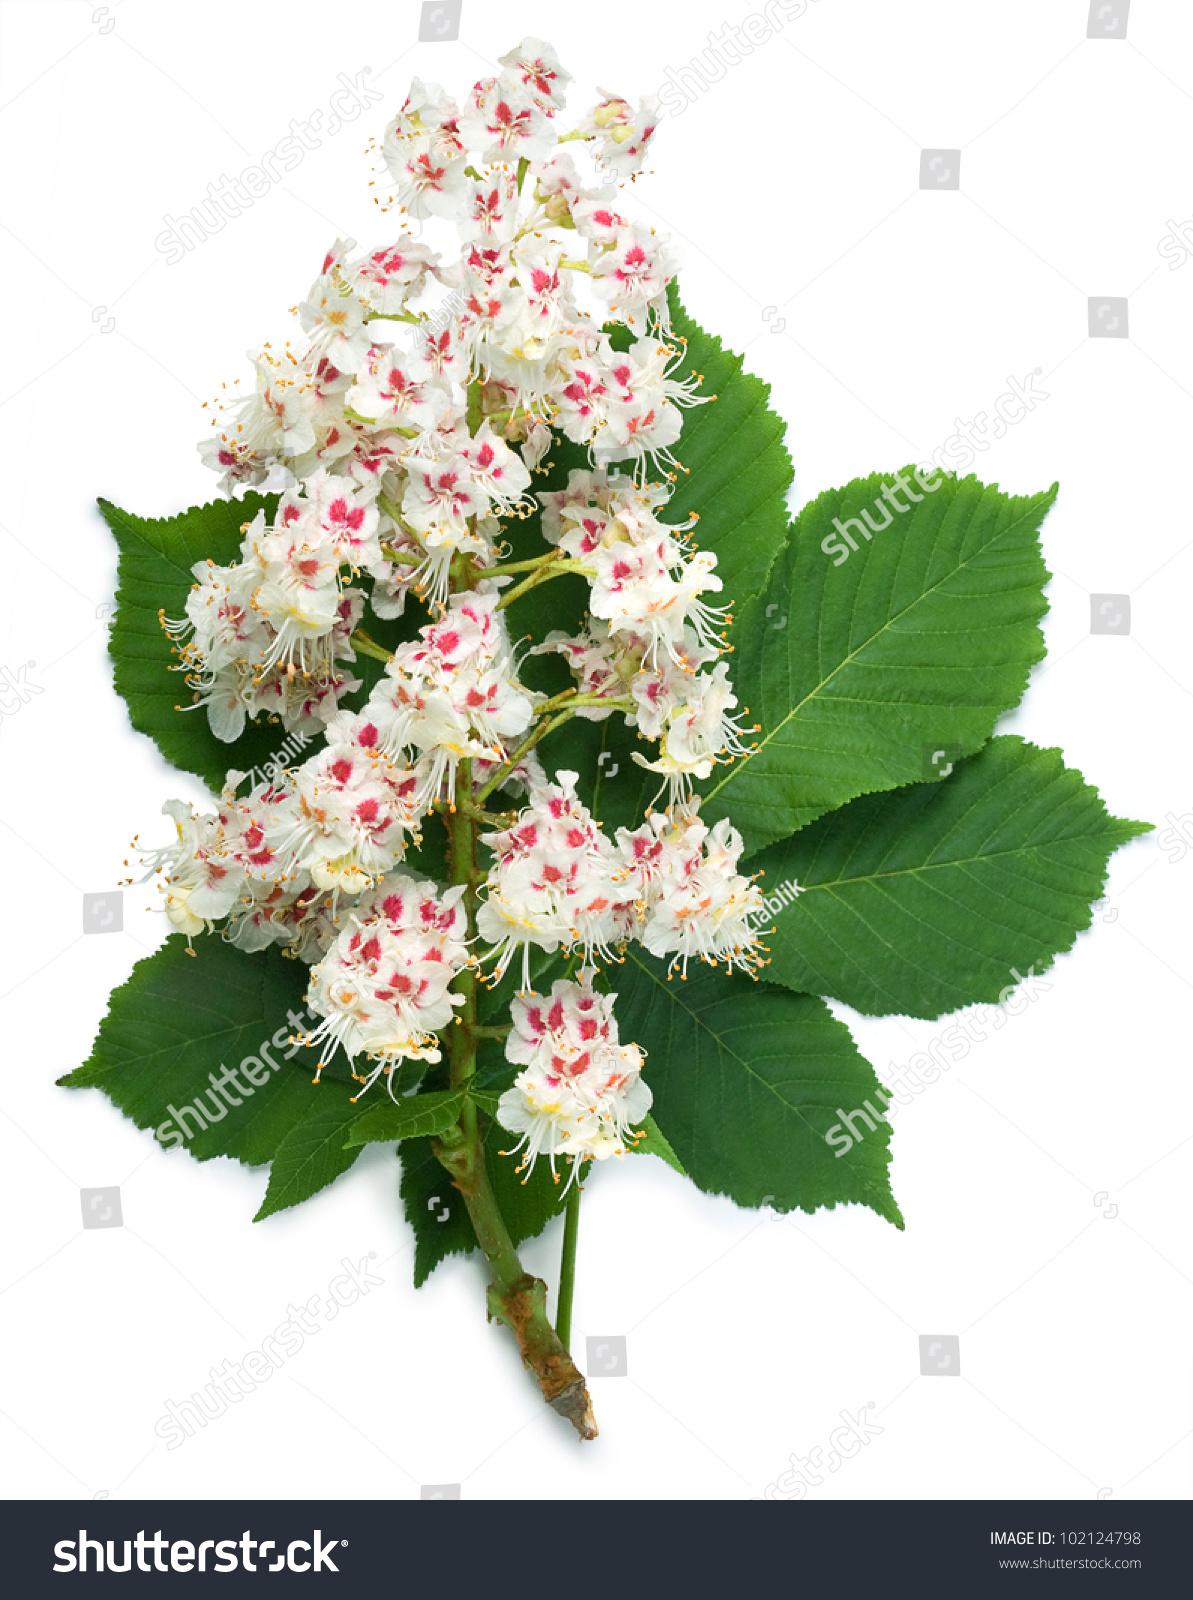 Horsechestnut Aesculus Hippocastanum Conker Tree Flowers Stock Photo